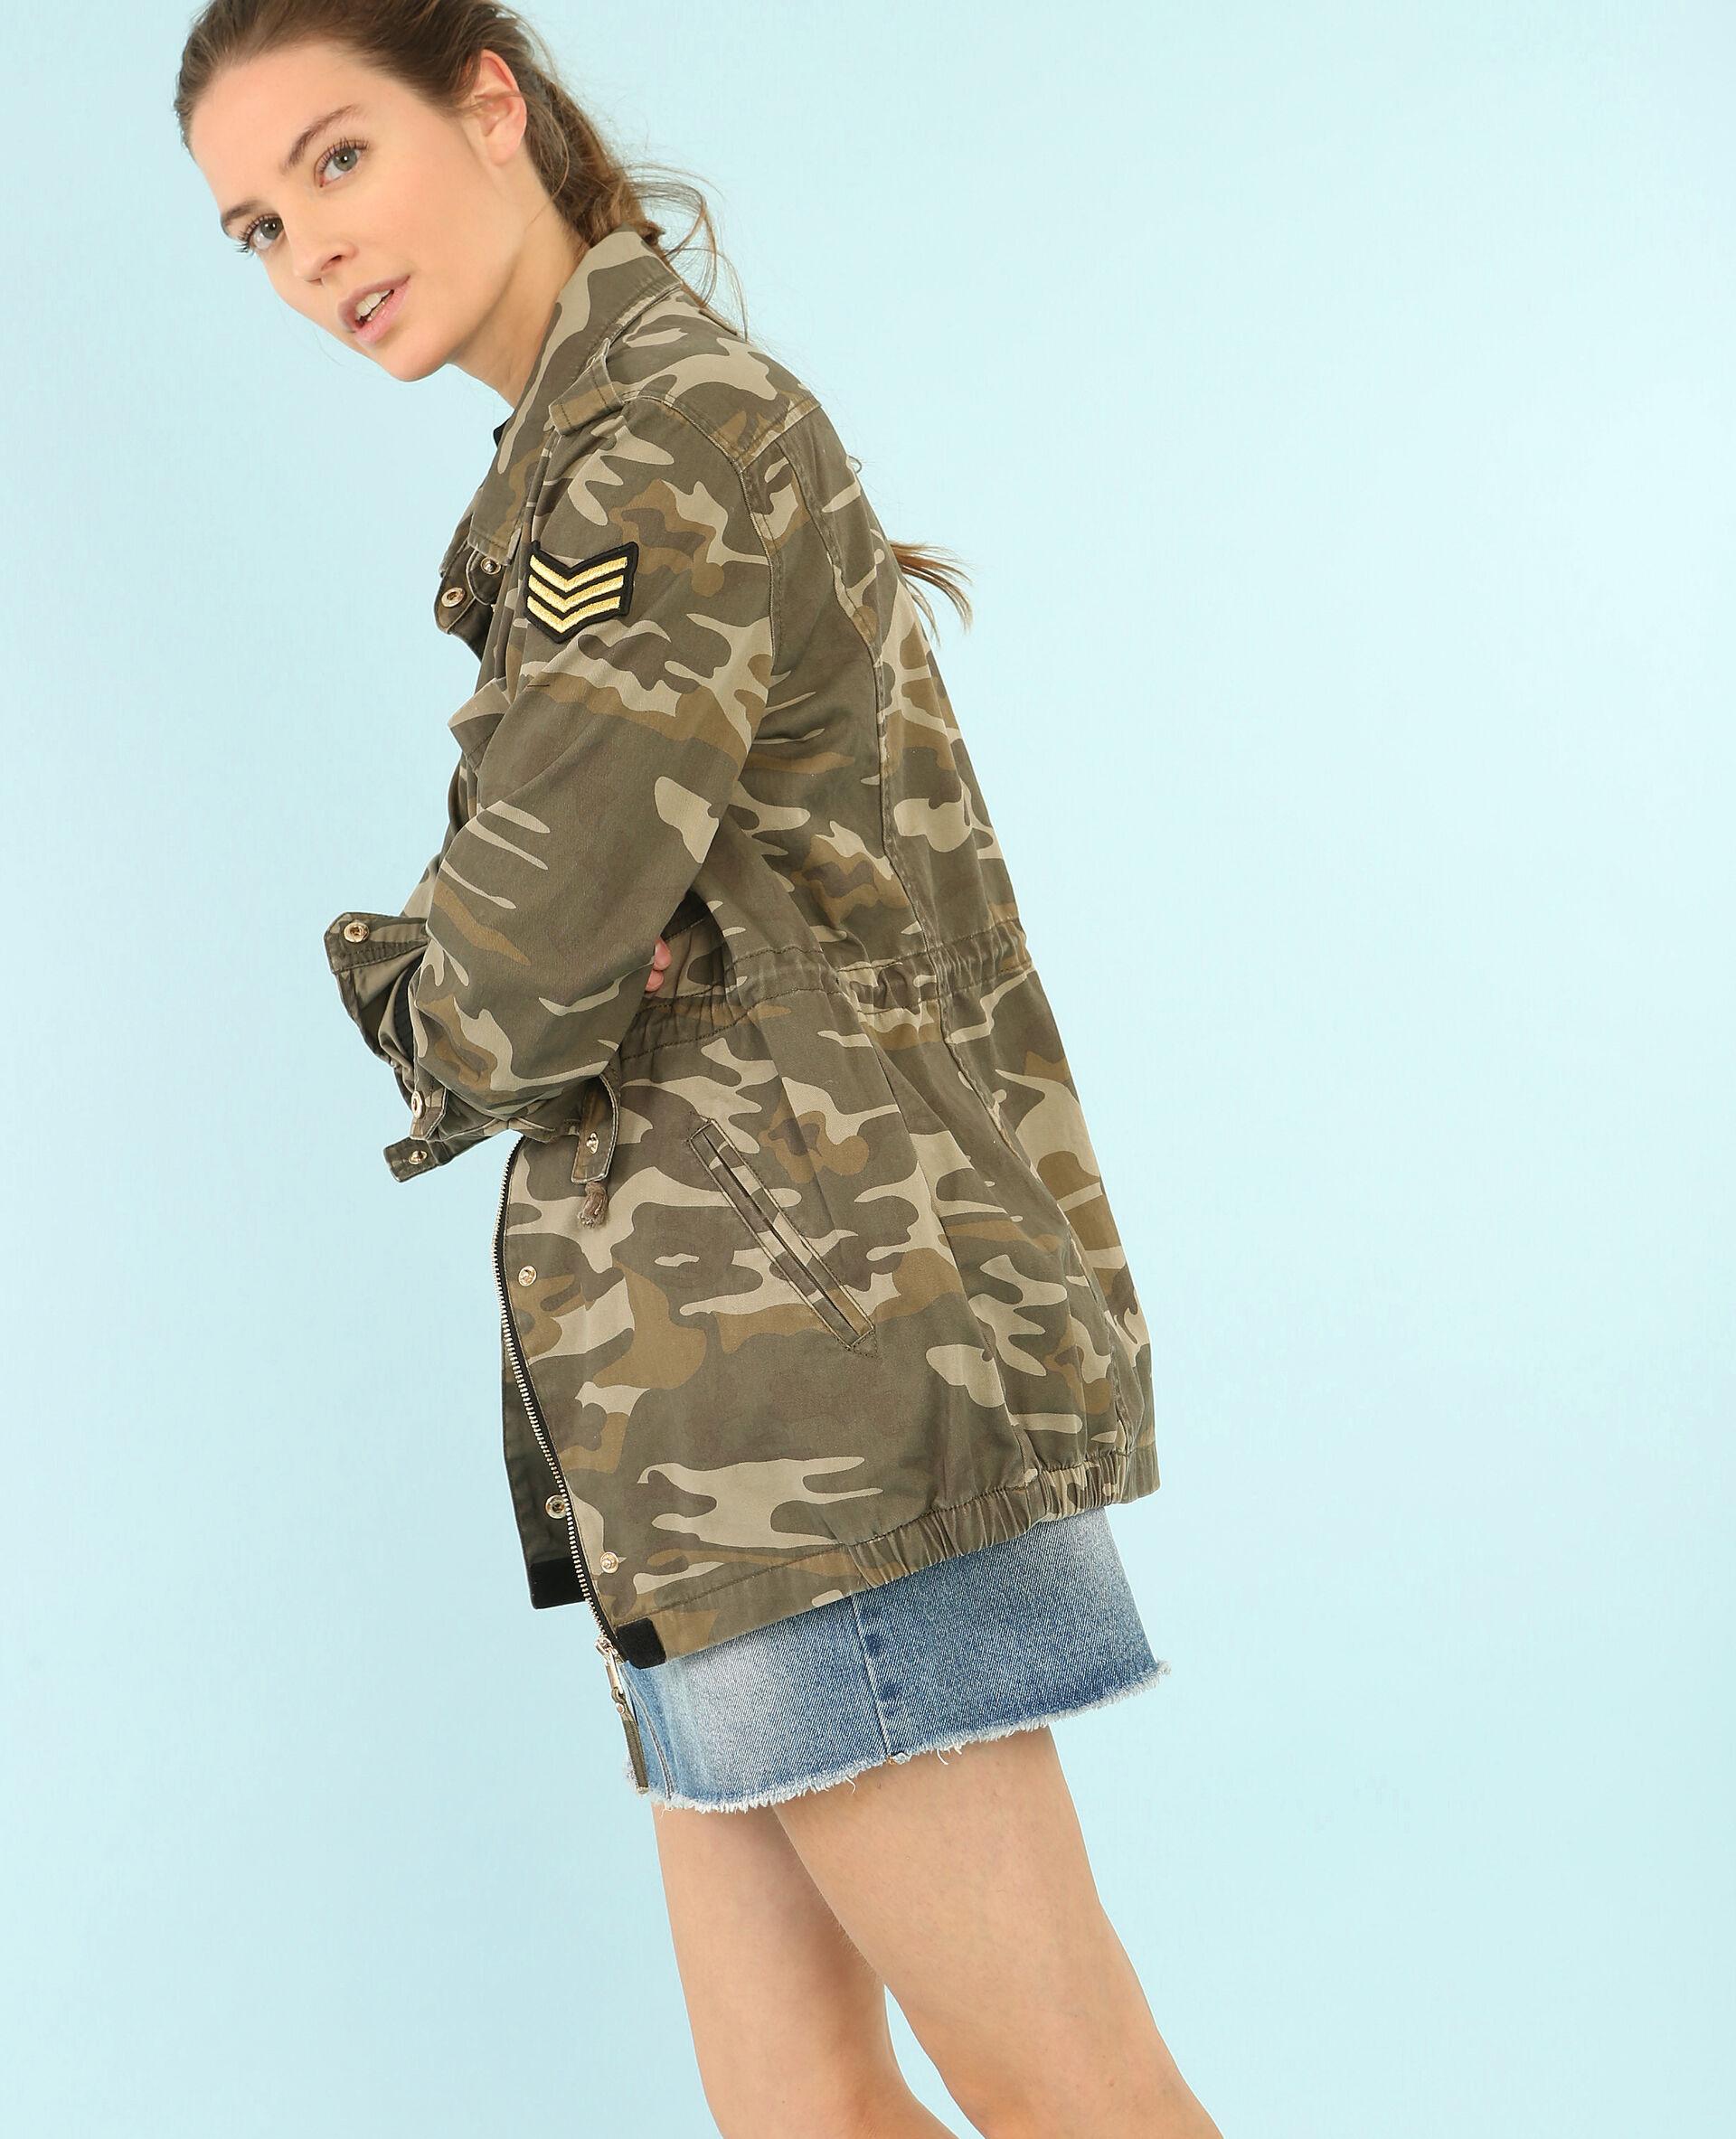 ⏳ Veste camouflage army Femme -50% - Couleur kaki - Taille L - PIMKIE - MODE FEMME